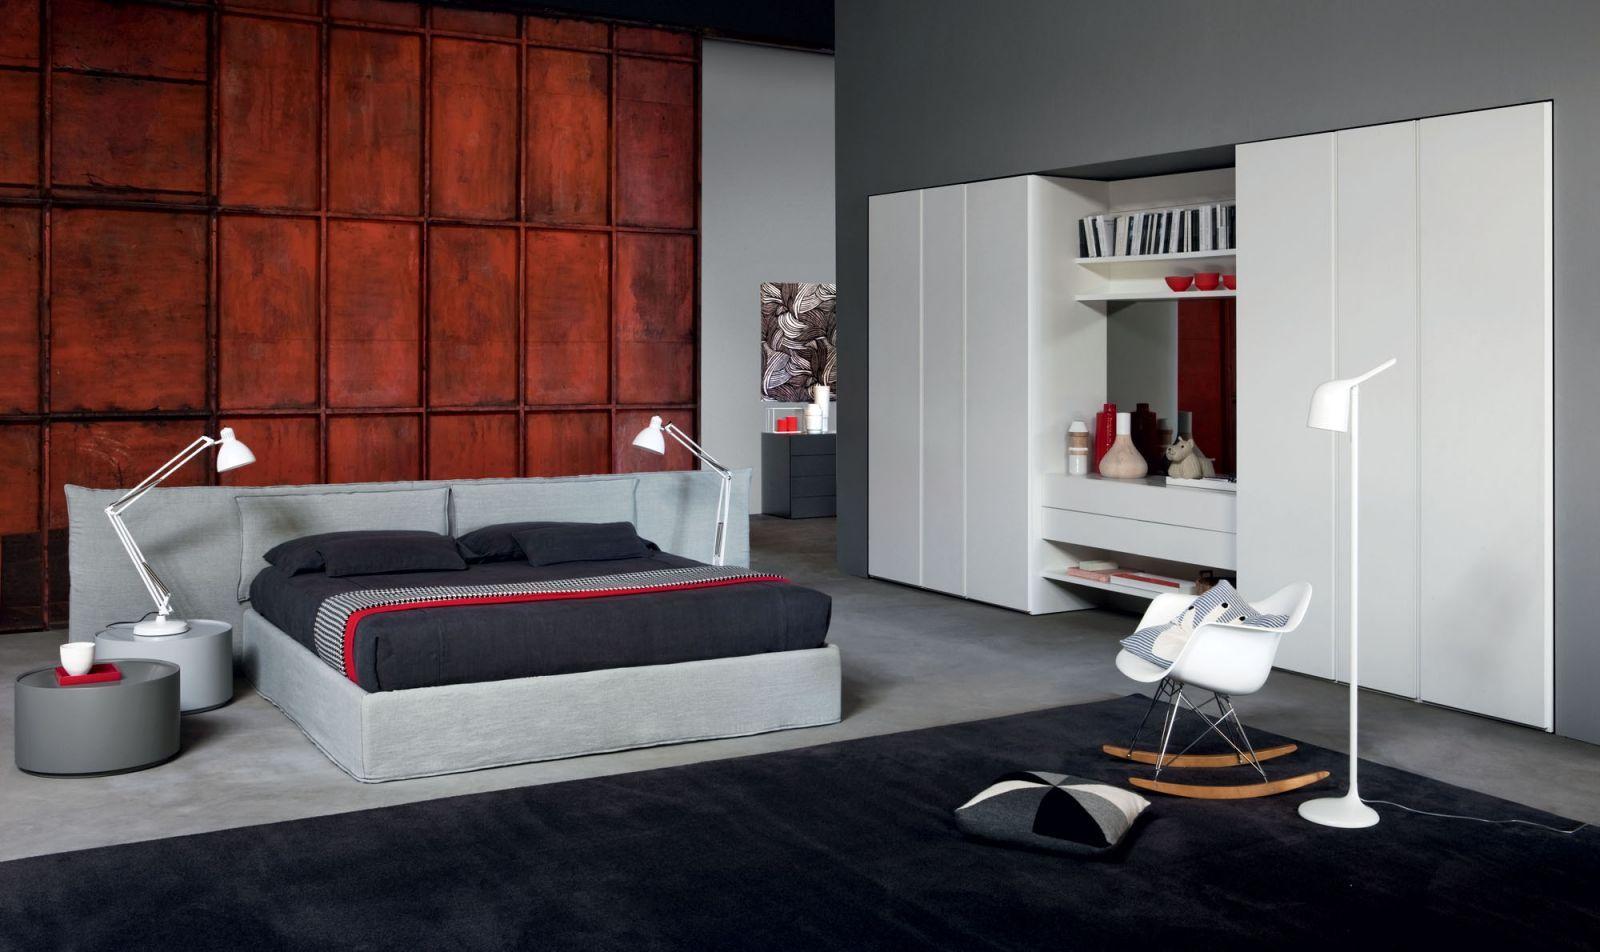 Black Carpet For Bedroom Novamobili Suite Bed Tempo Notte Design Made In Italy Book